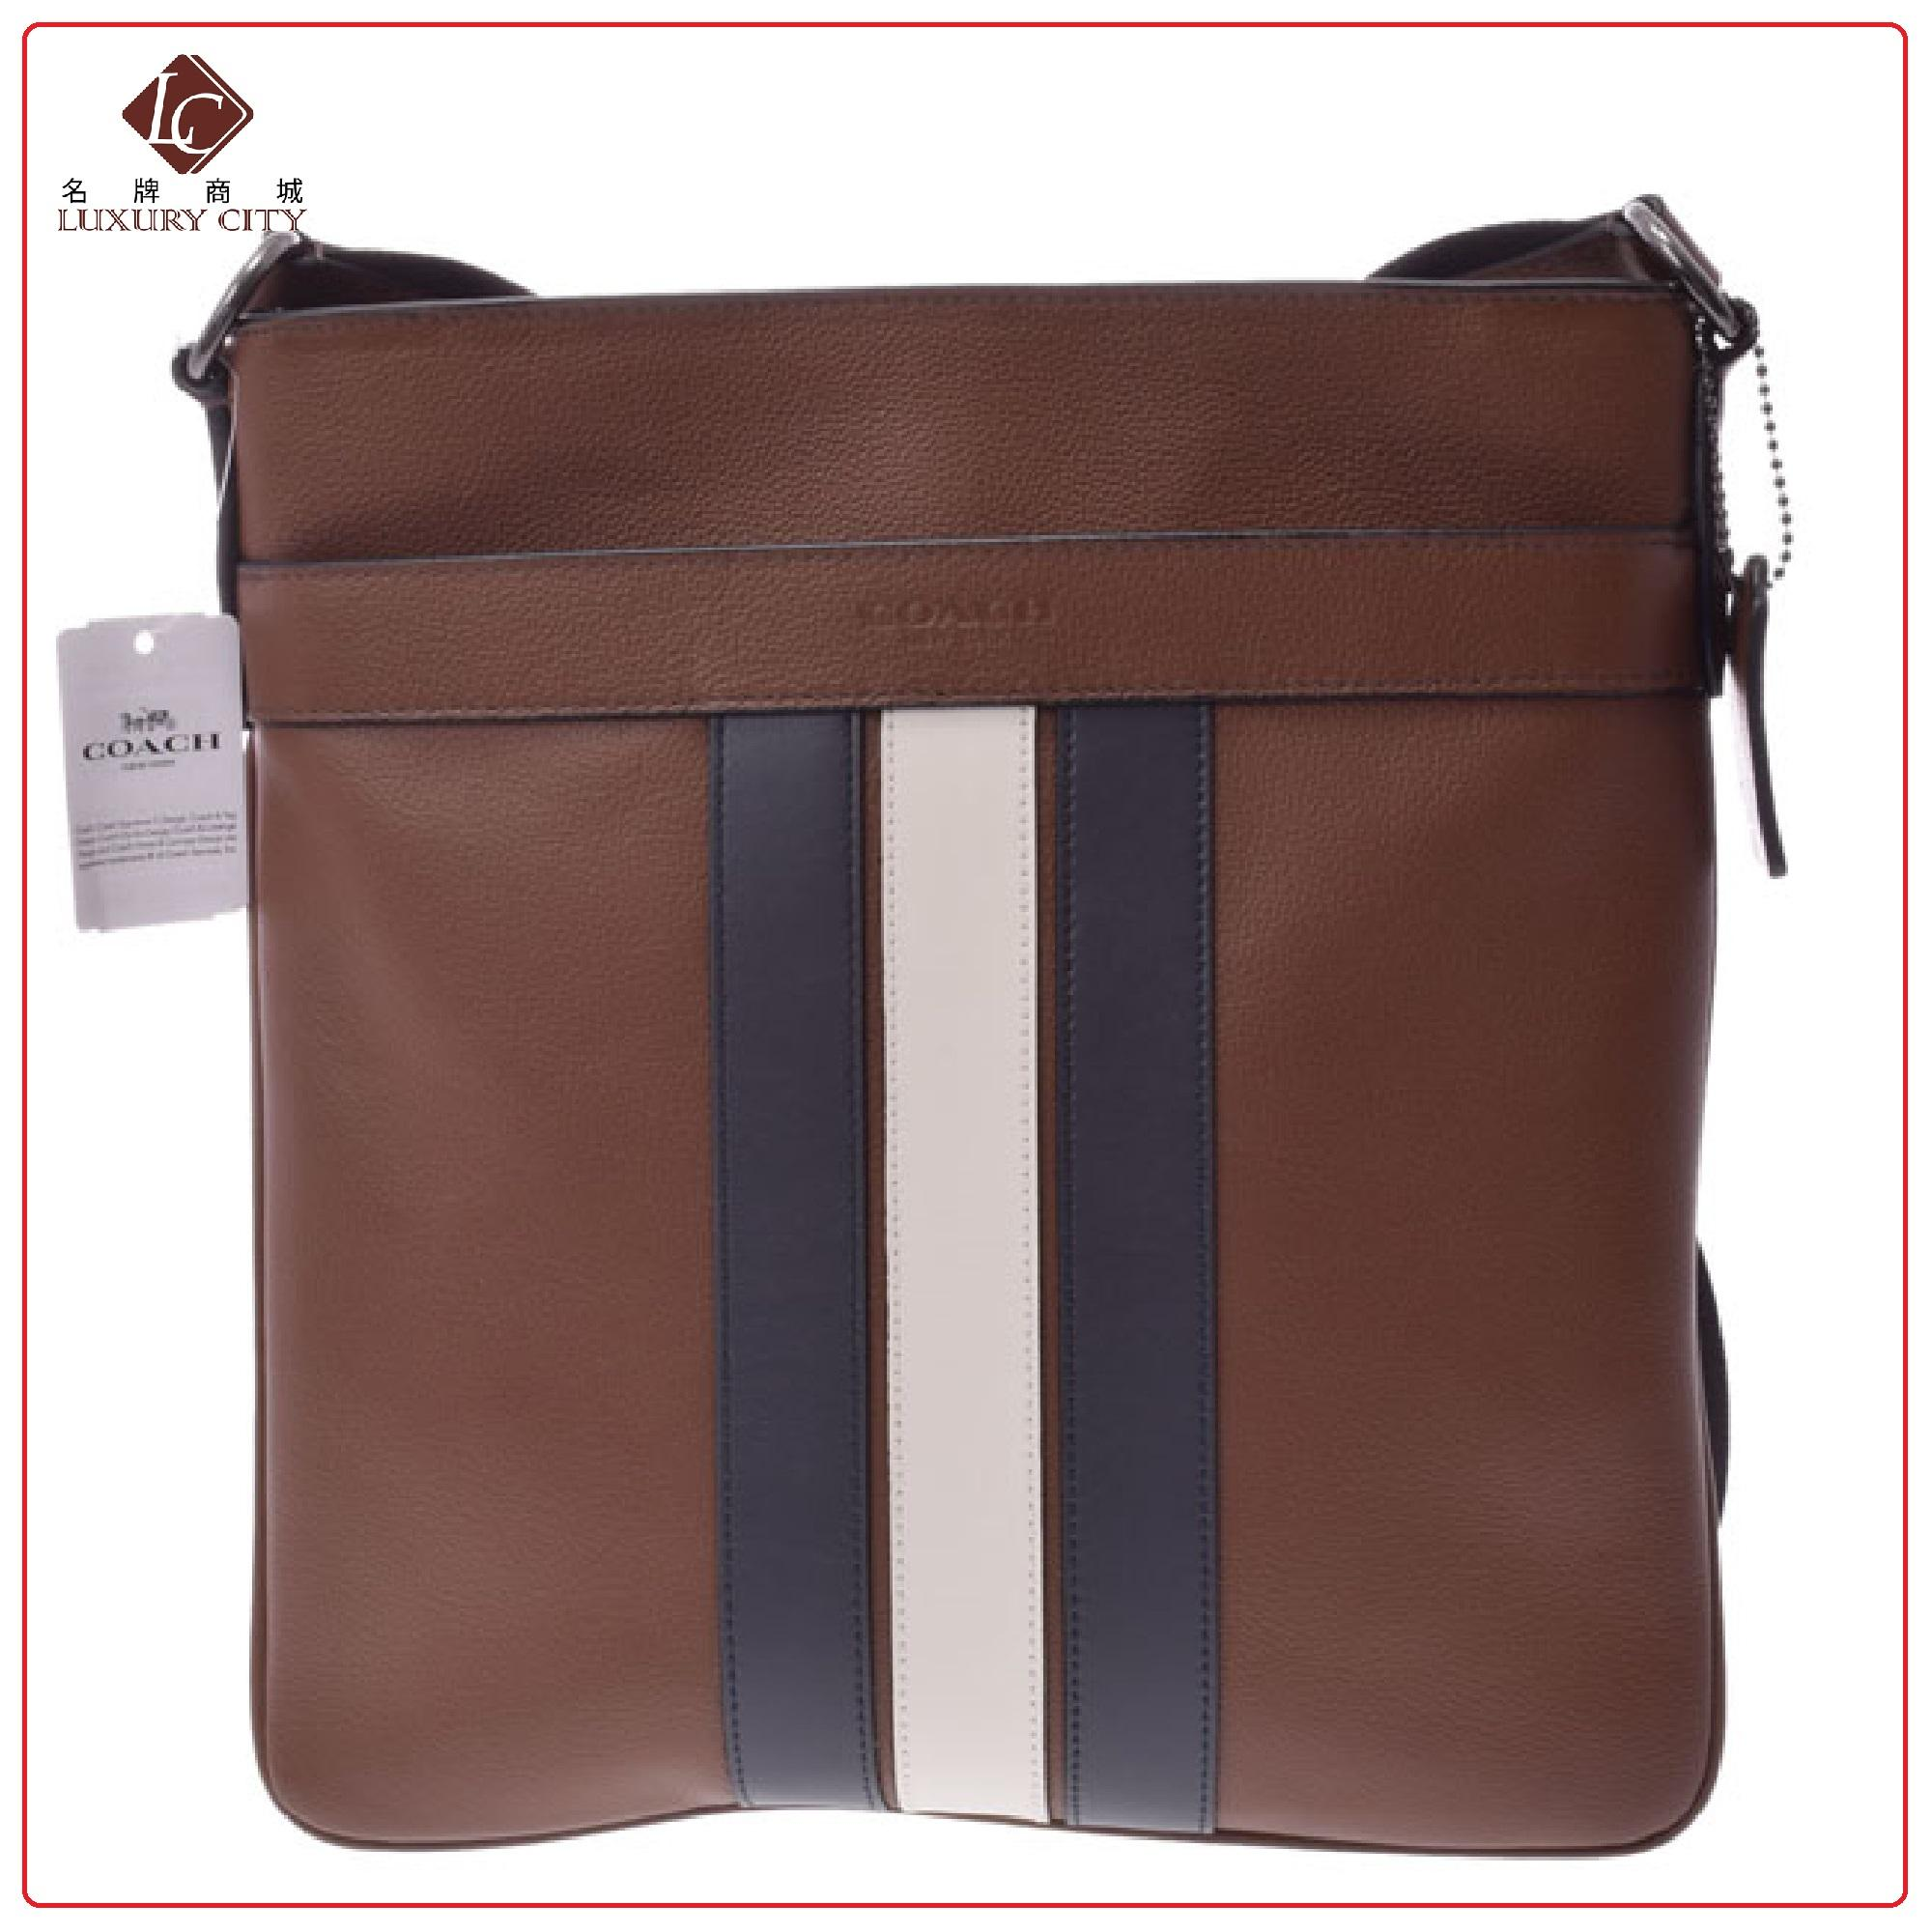 Latest Coach Men Messenger Bags Products   Enjoy Huge Discounts ... 86e971235f